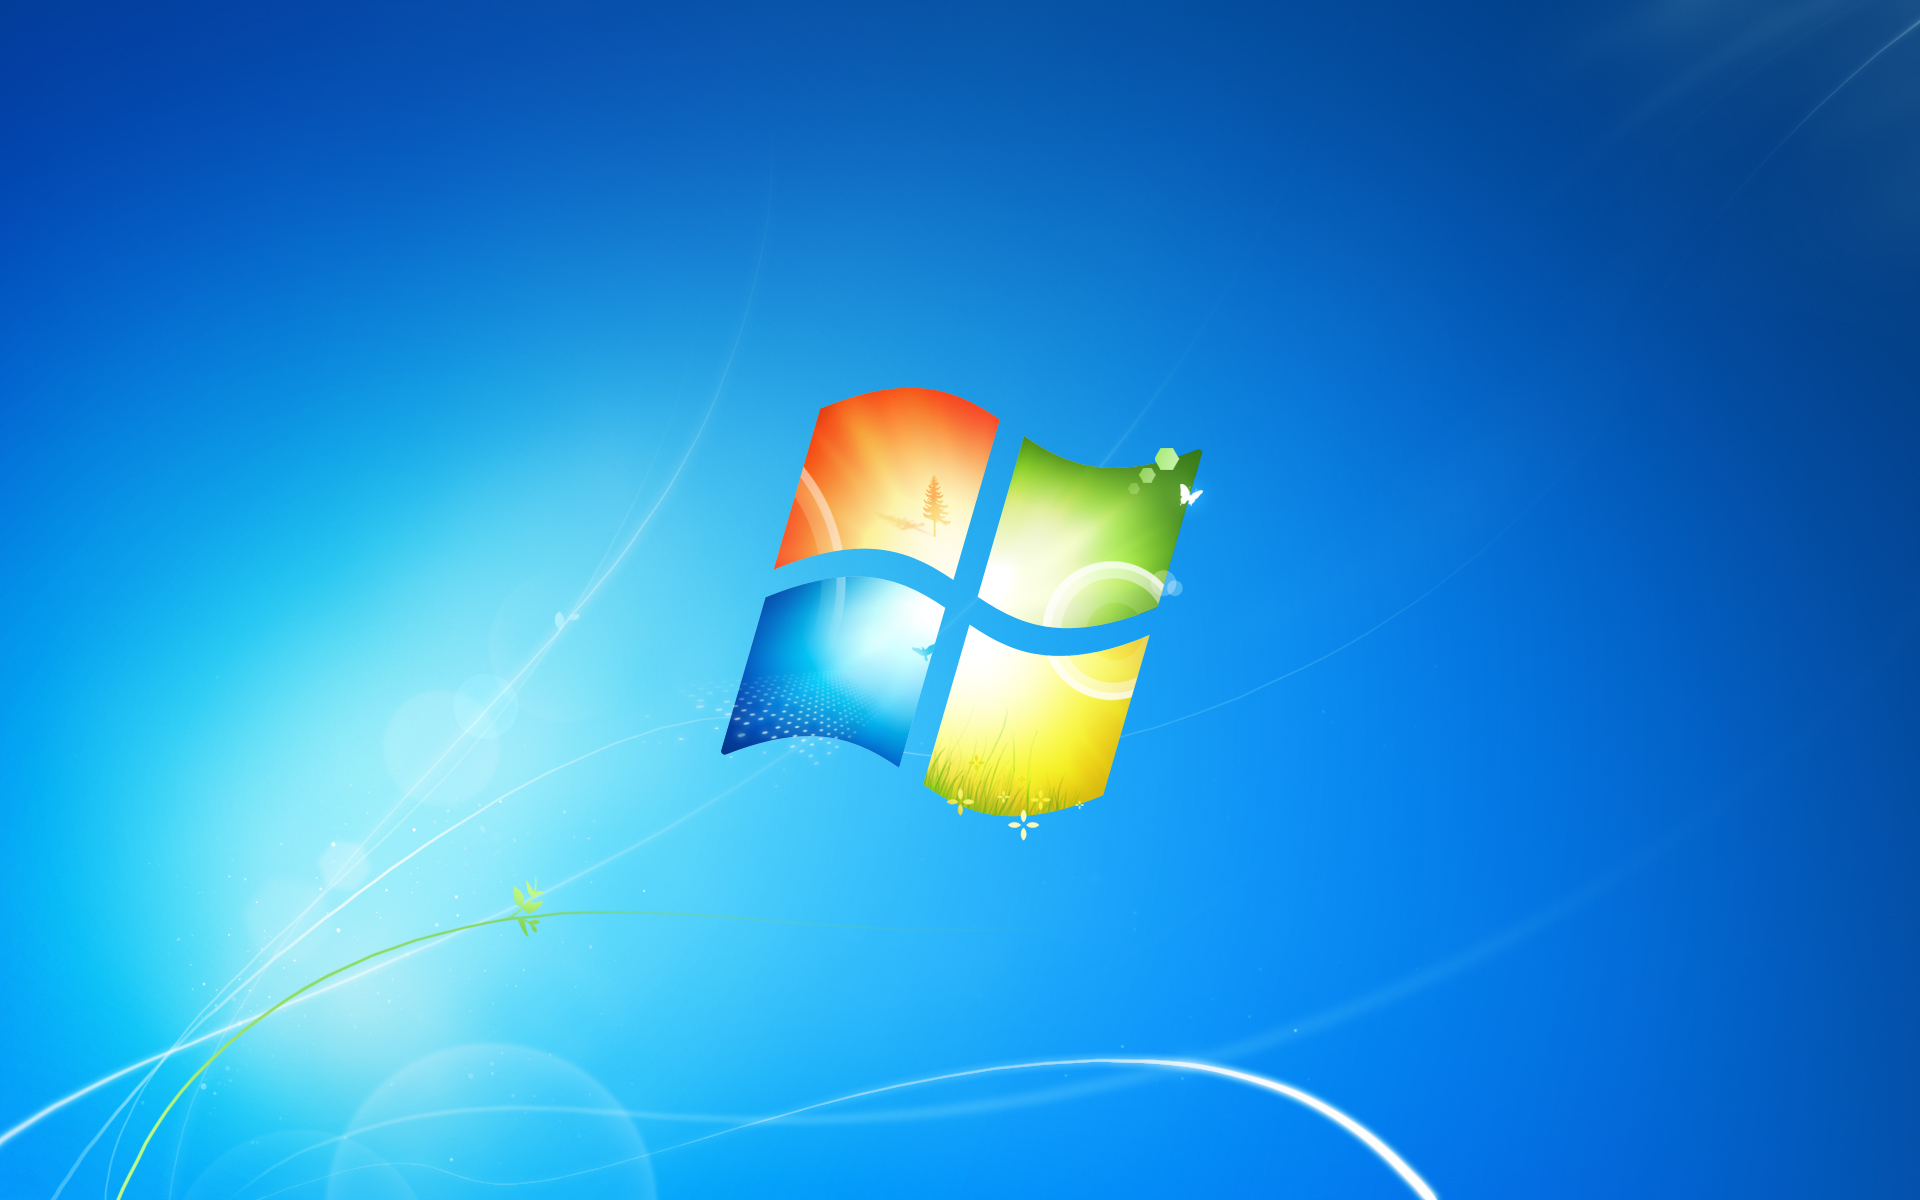 Windows 7 has a new default wallpaper and logo | ZDNet